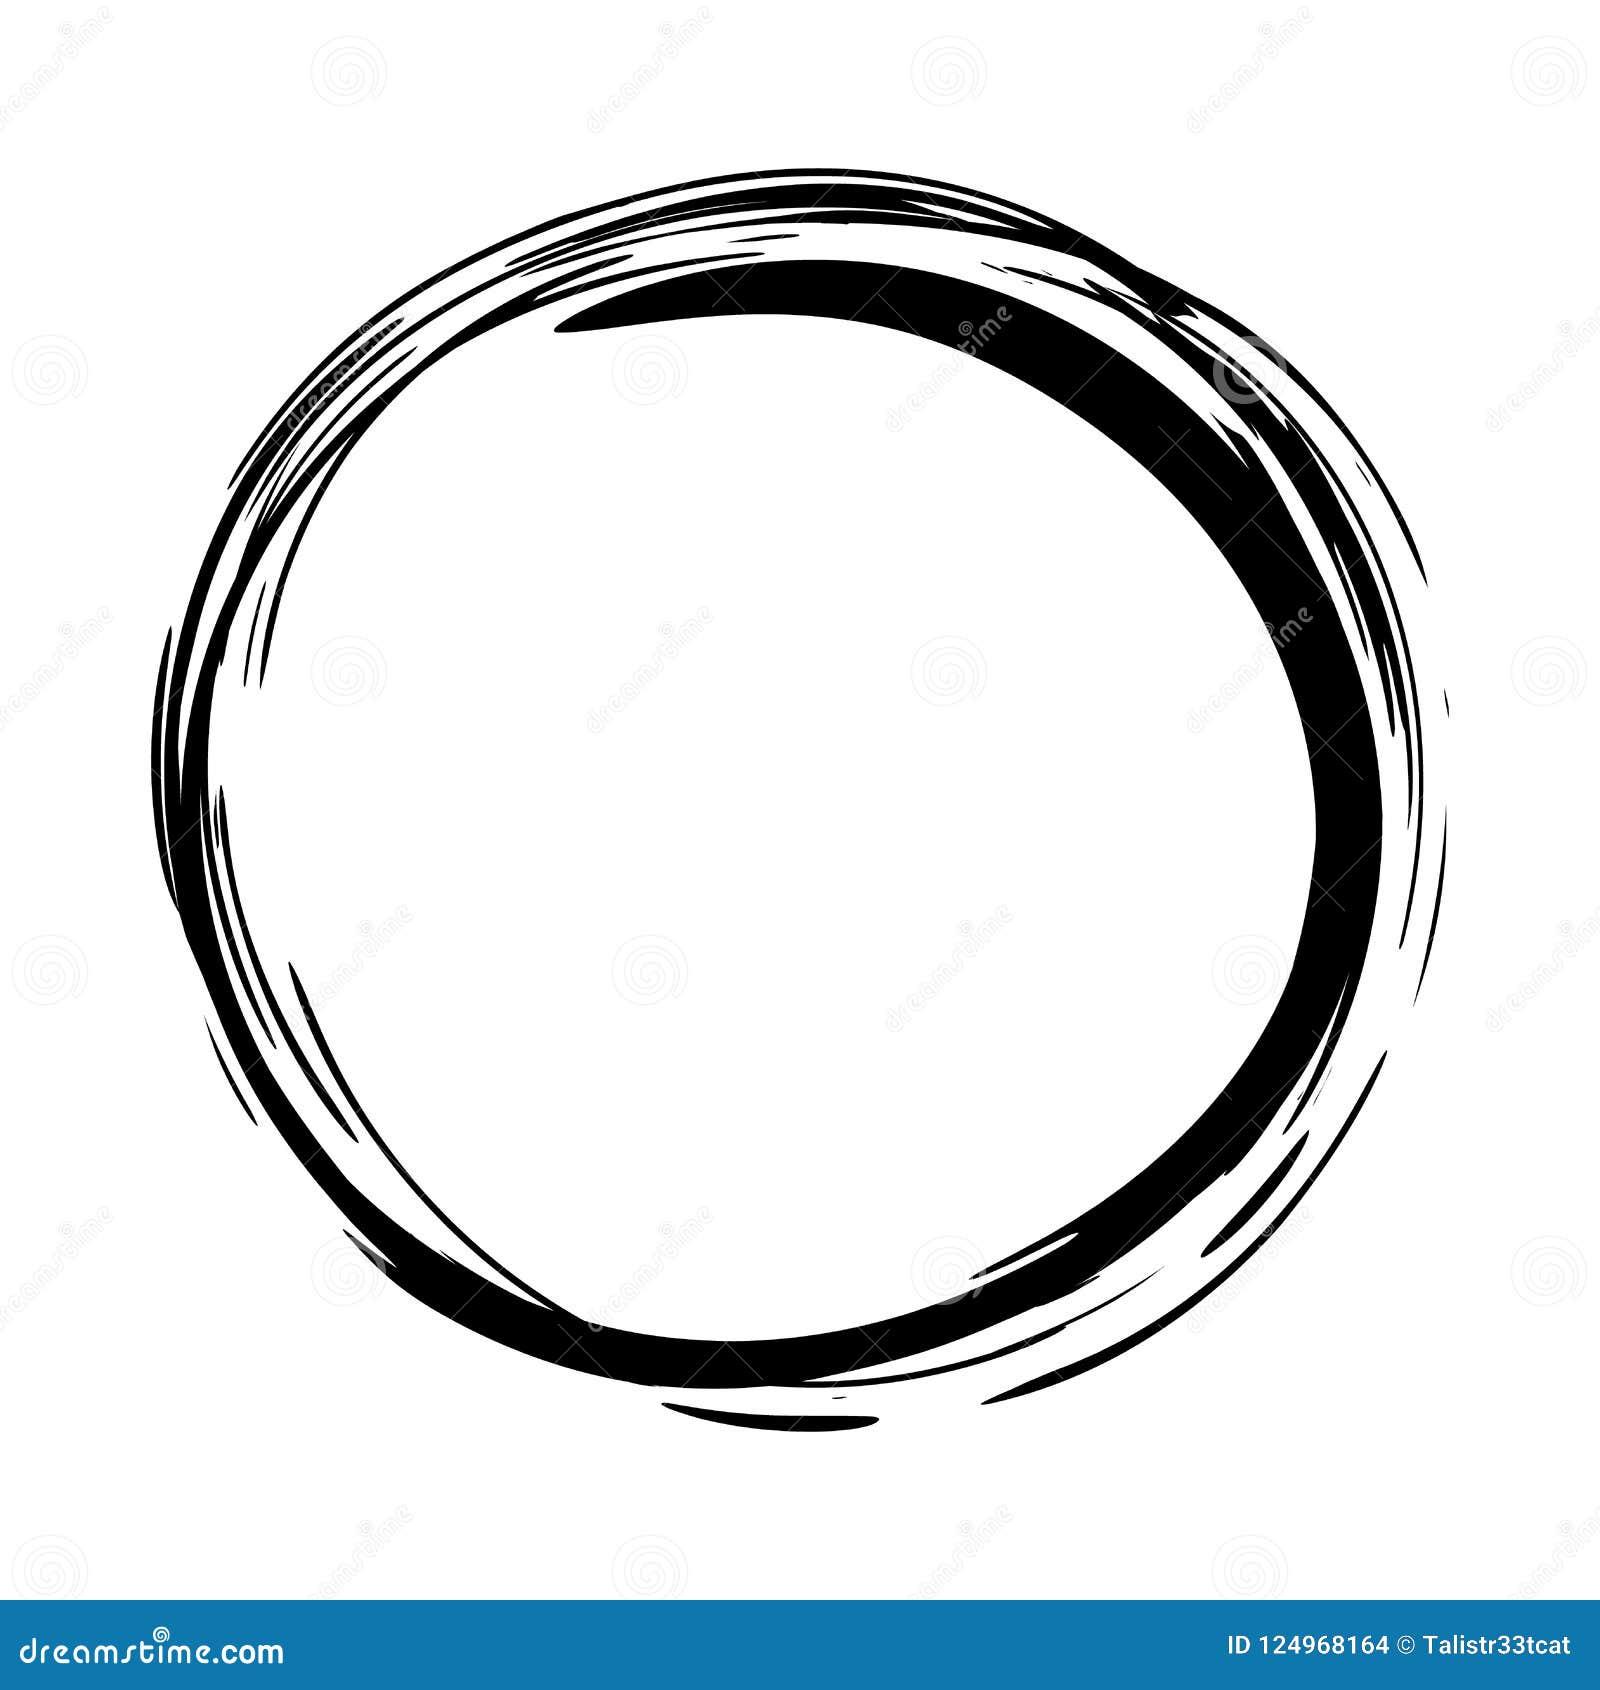 Grungy round ink circle